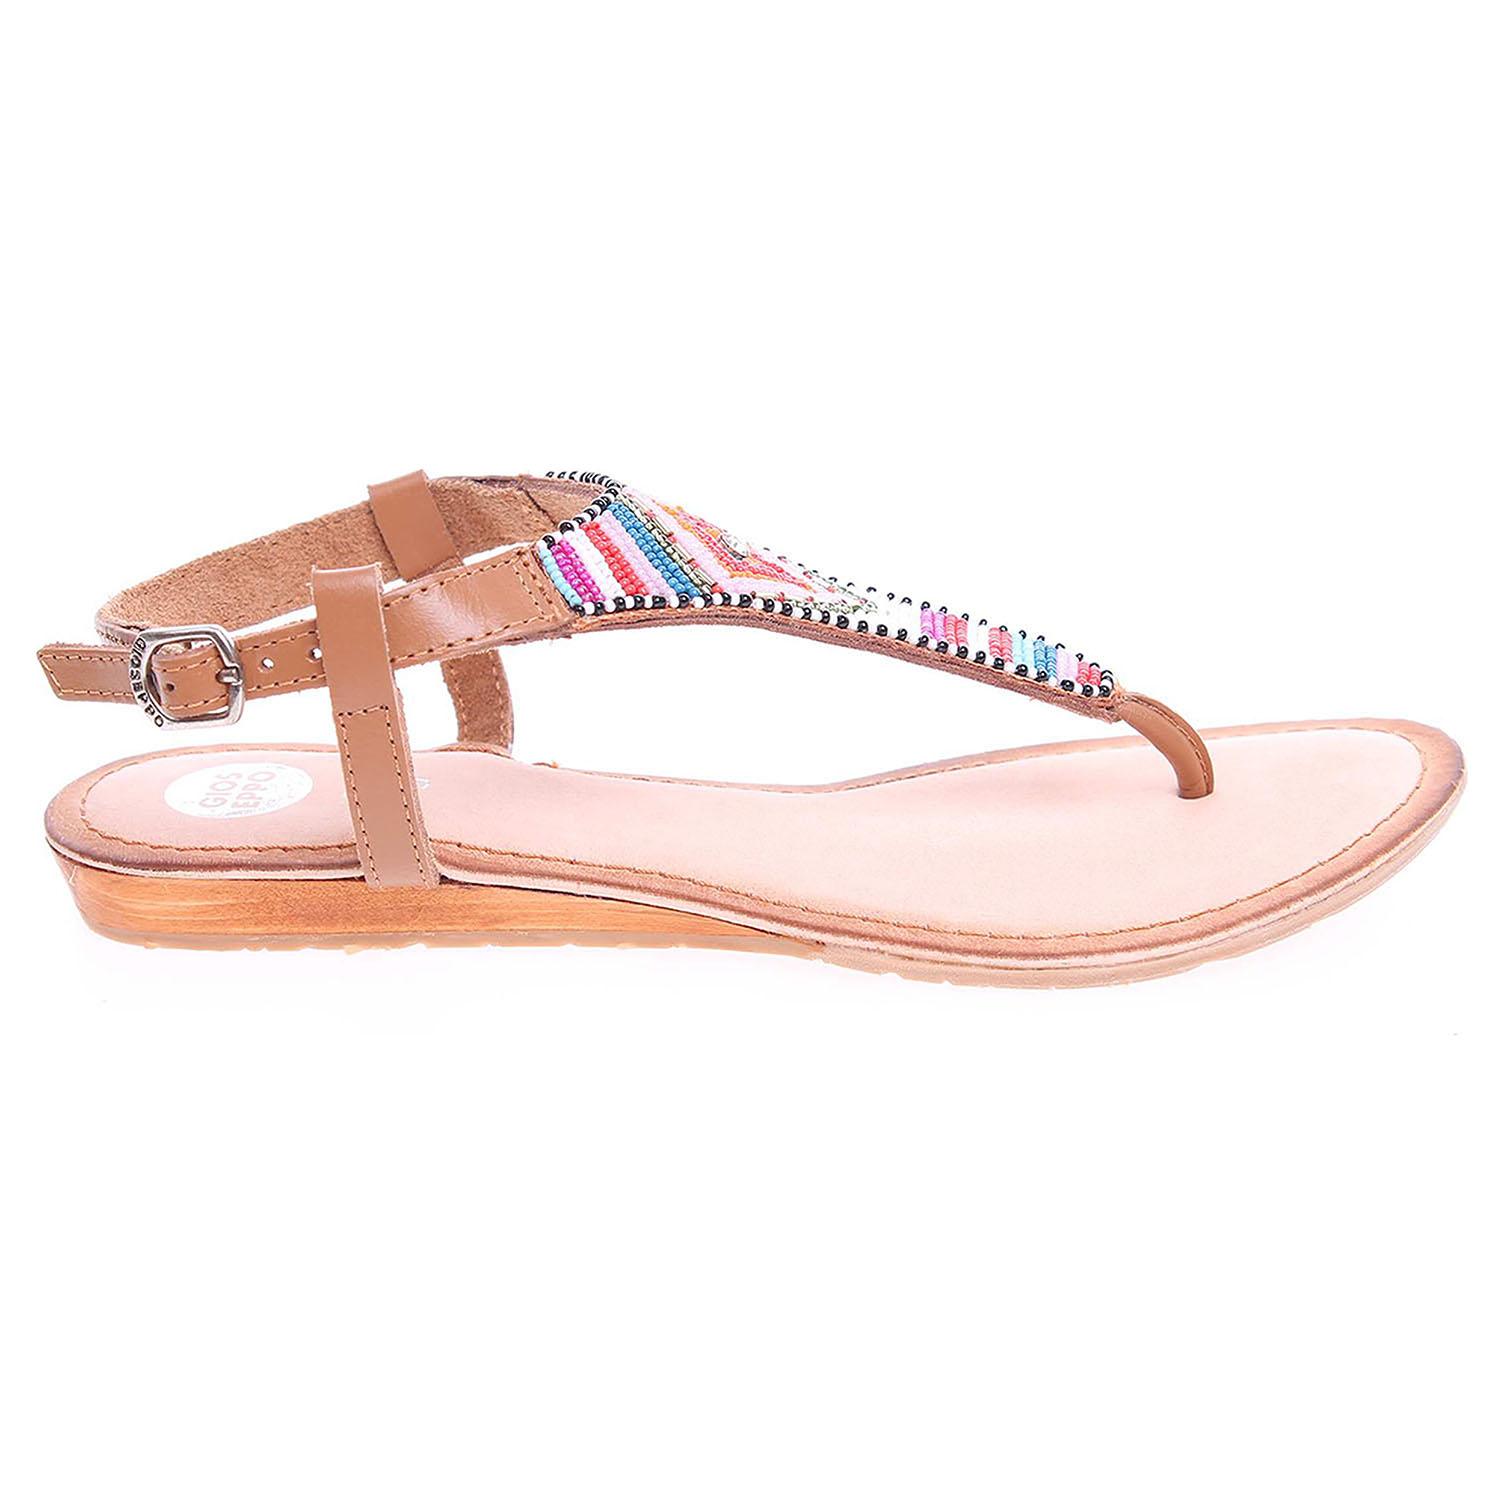 Gioseppo Magnien dámské sandály multicolor 41